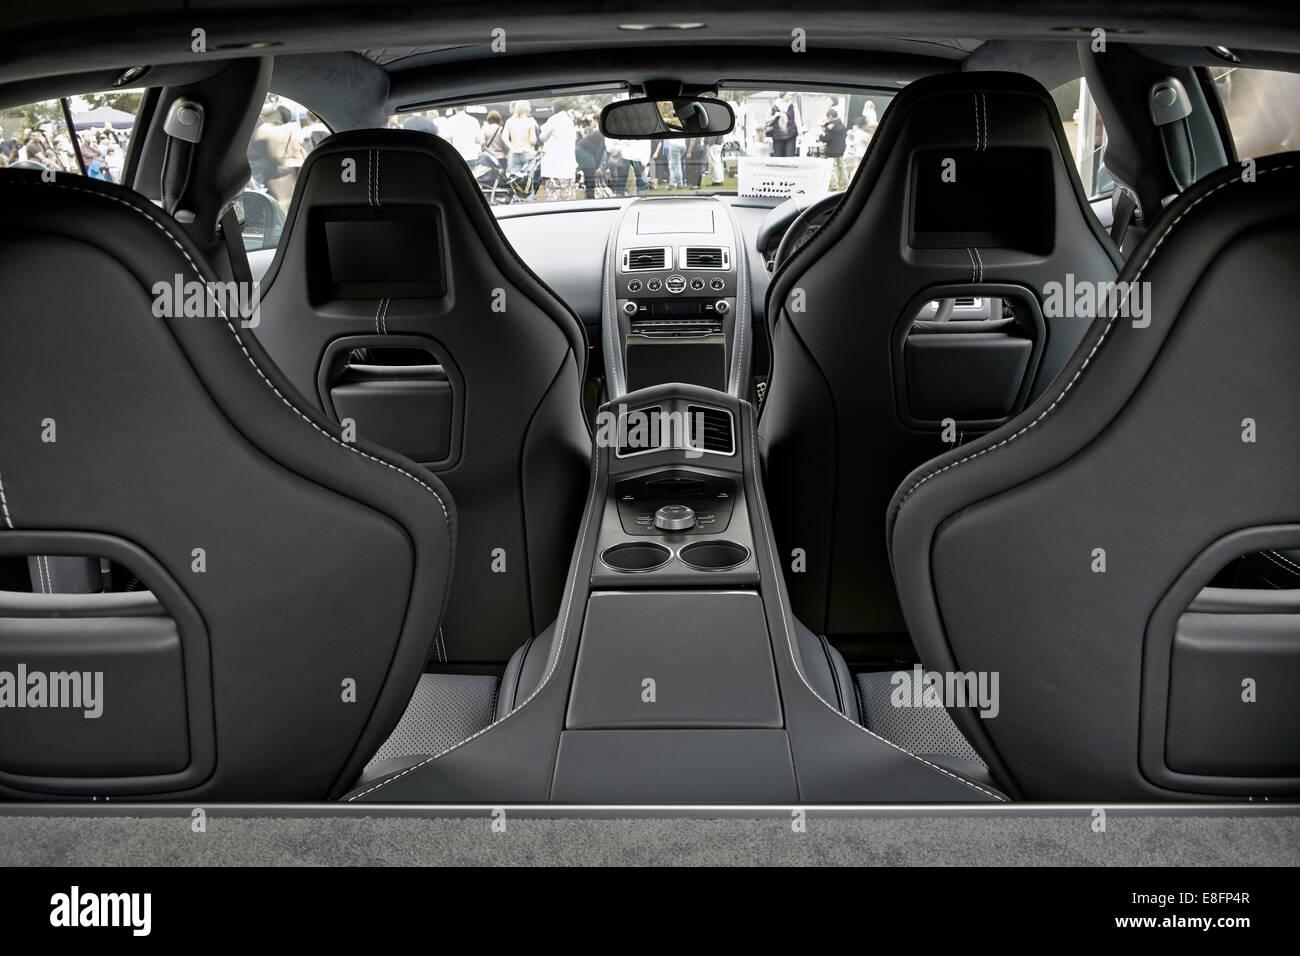 Rear View Of The Interior Of A Aston Martin Rapide S Supercar